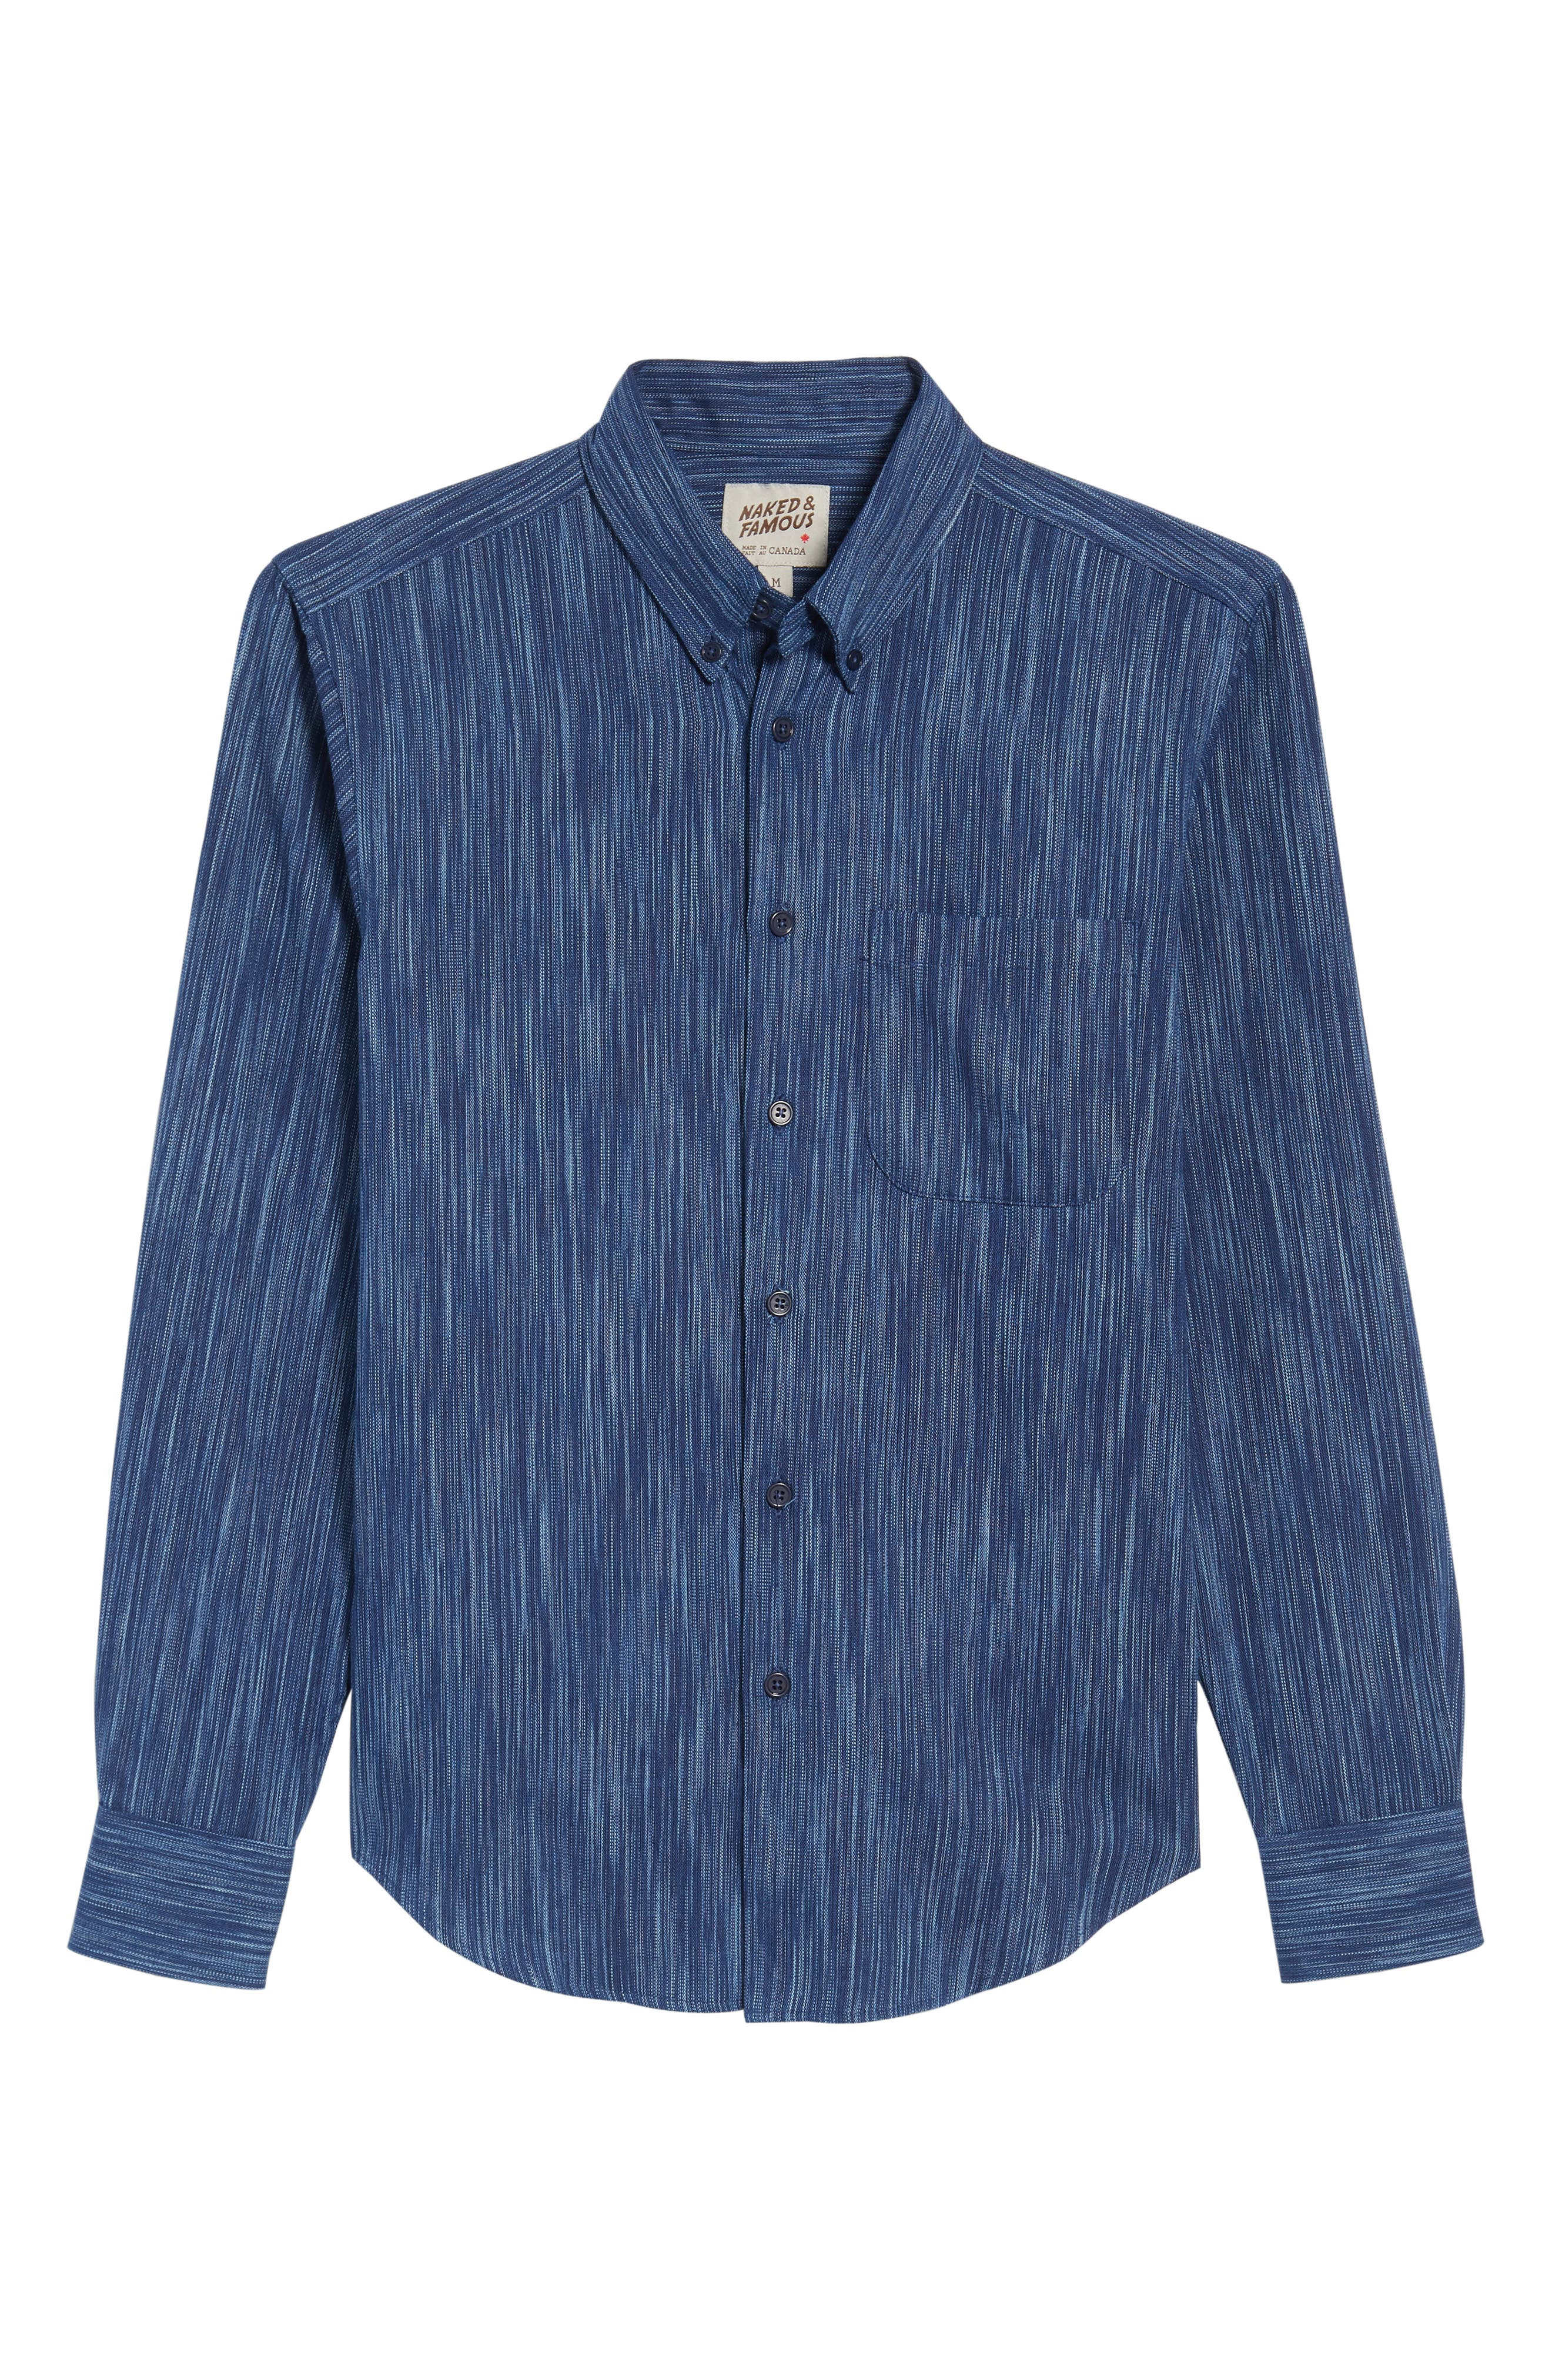 Indigo Tie Dye Rain Weave Shirt,                             Alternate thumbnail 6, color,                             401